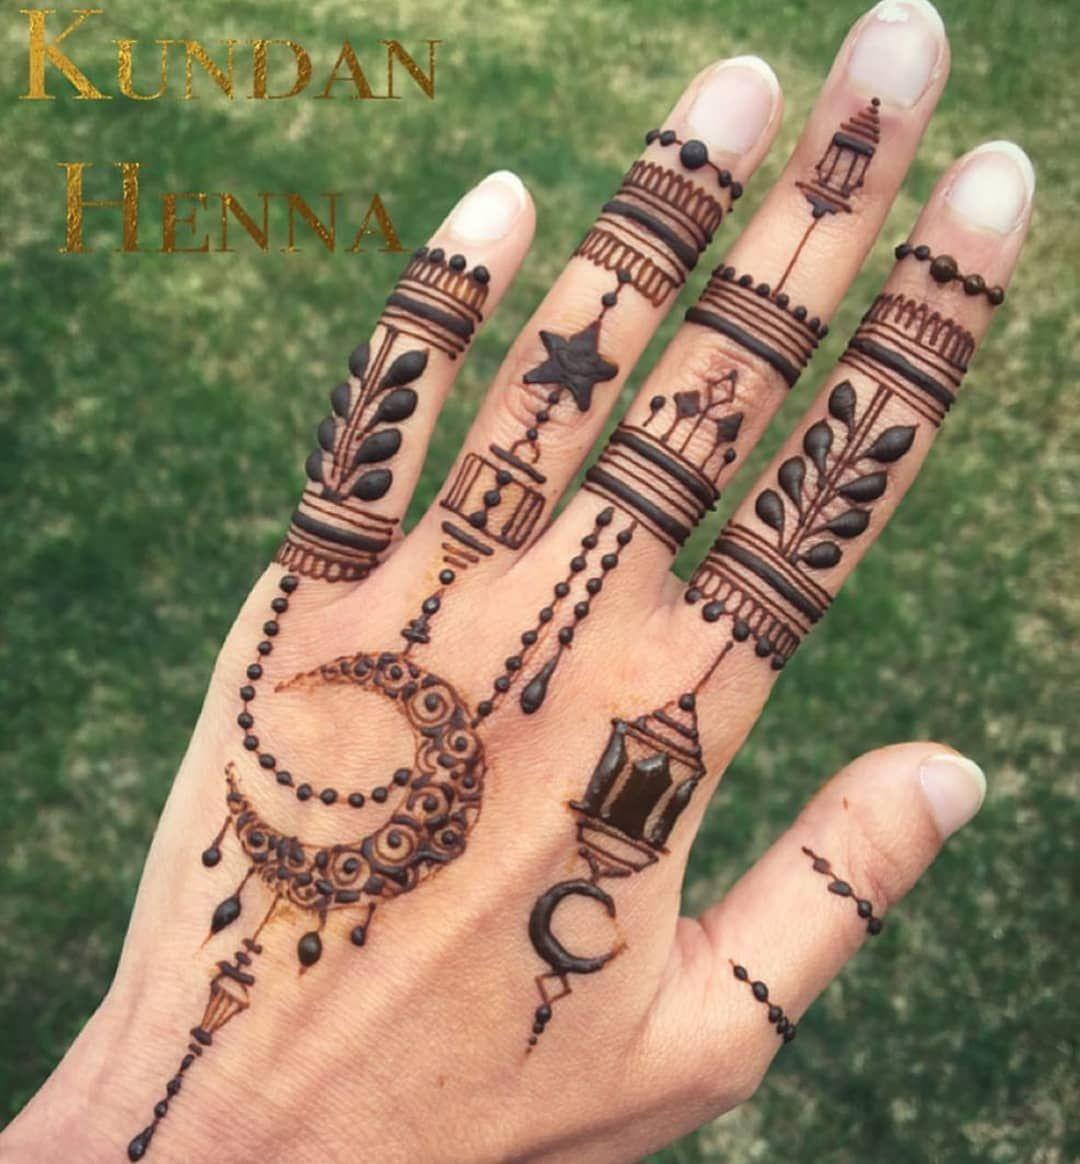 Ramadan Henna Designs How To Get Extra Festive This Season Ramadan Henna Designs Henna Latest Mehndi Designs Henna Tattoo Designs Henna Designs Hand